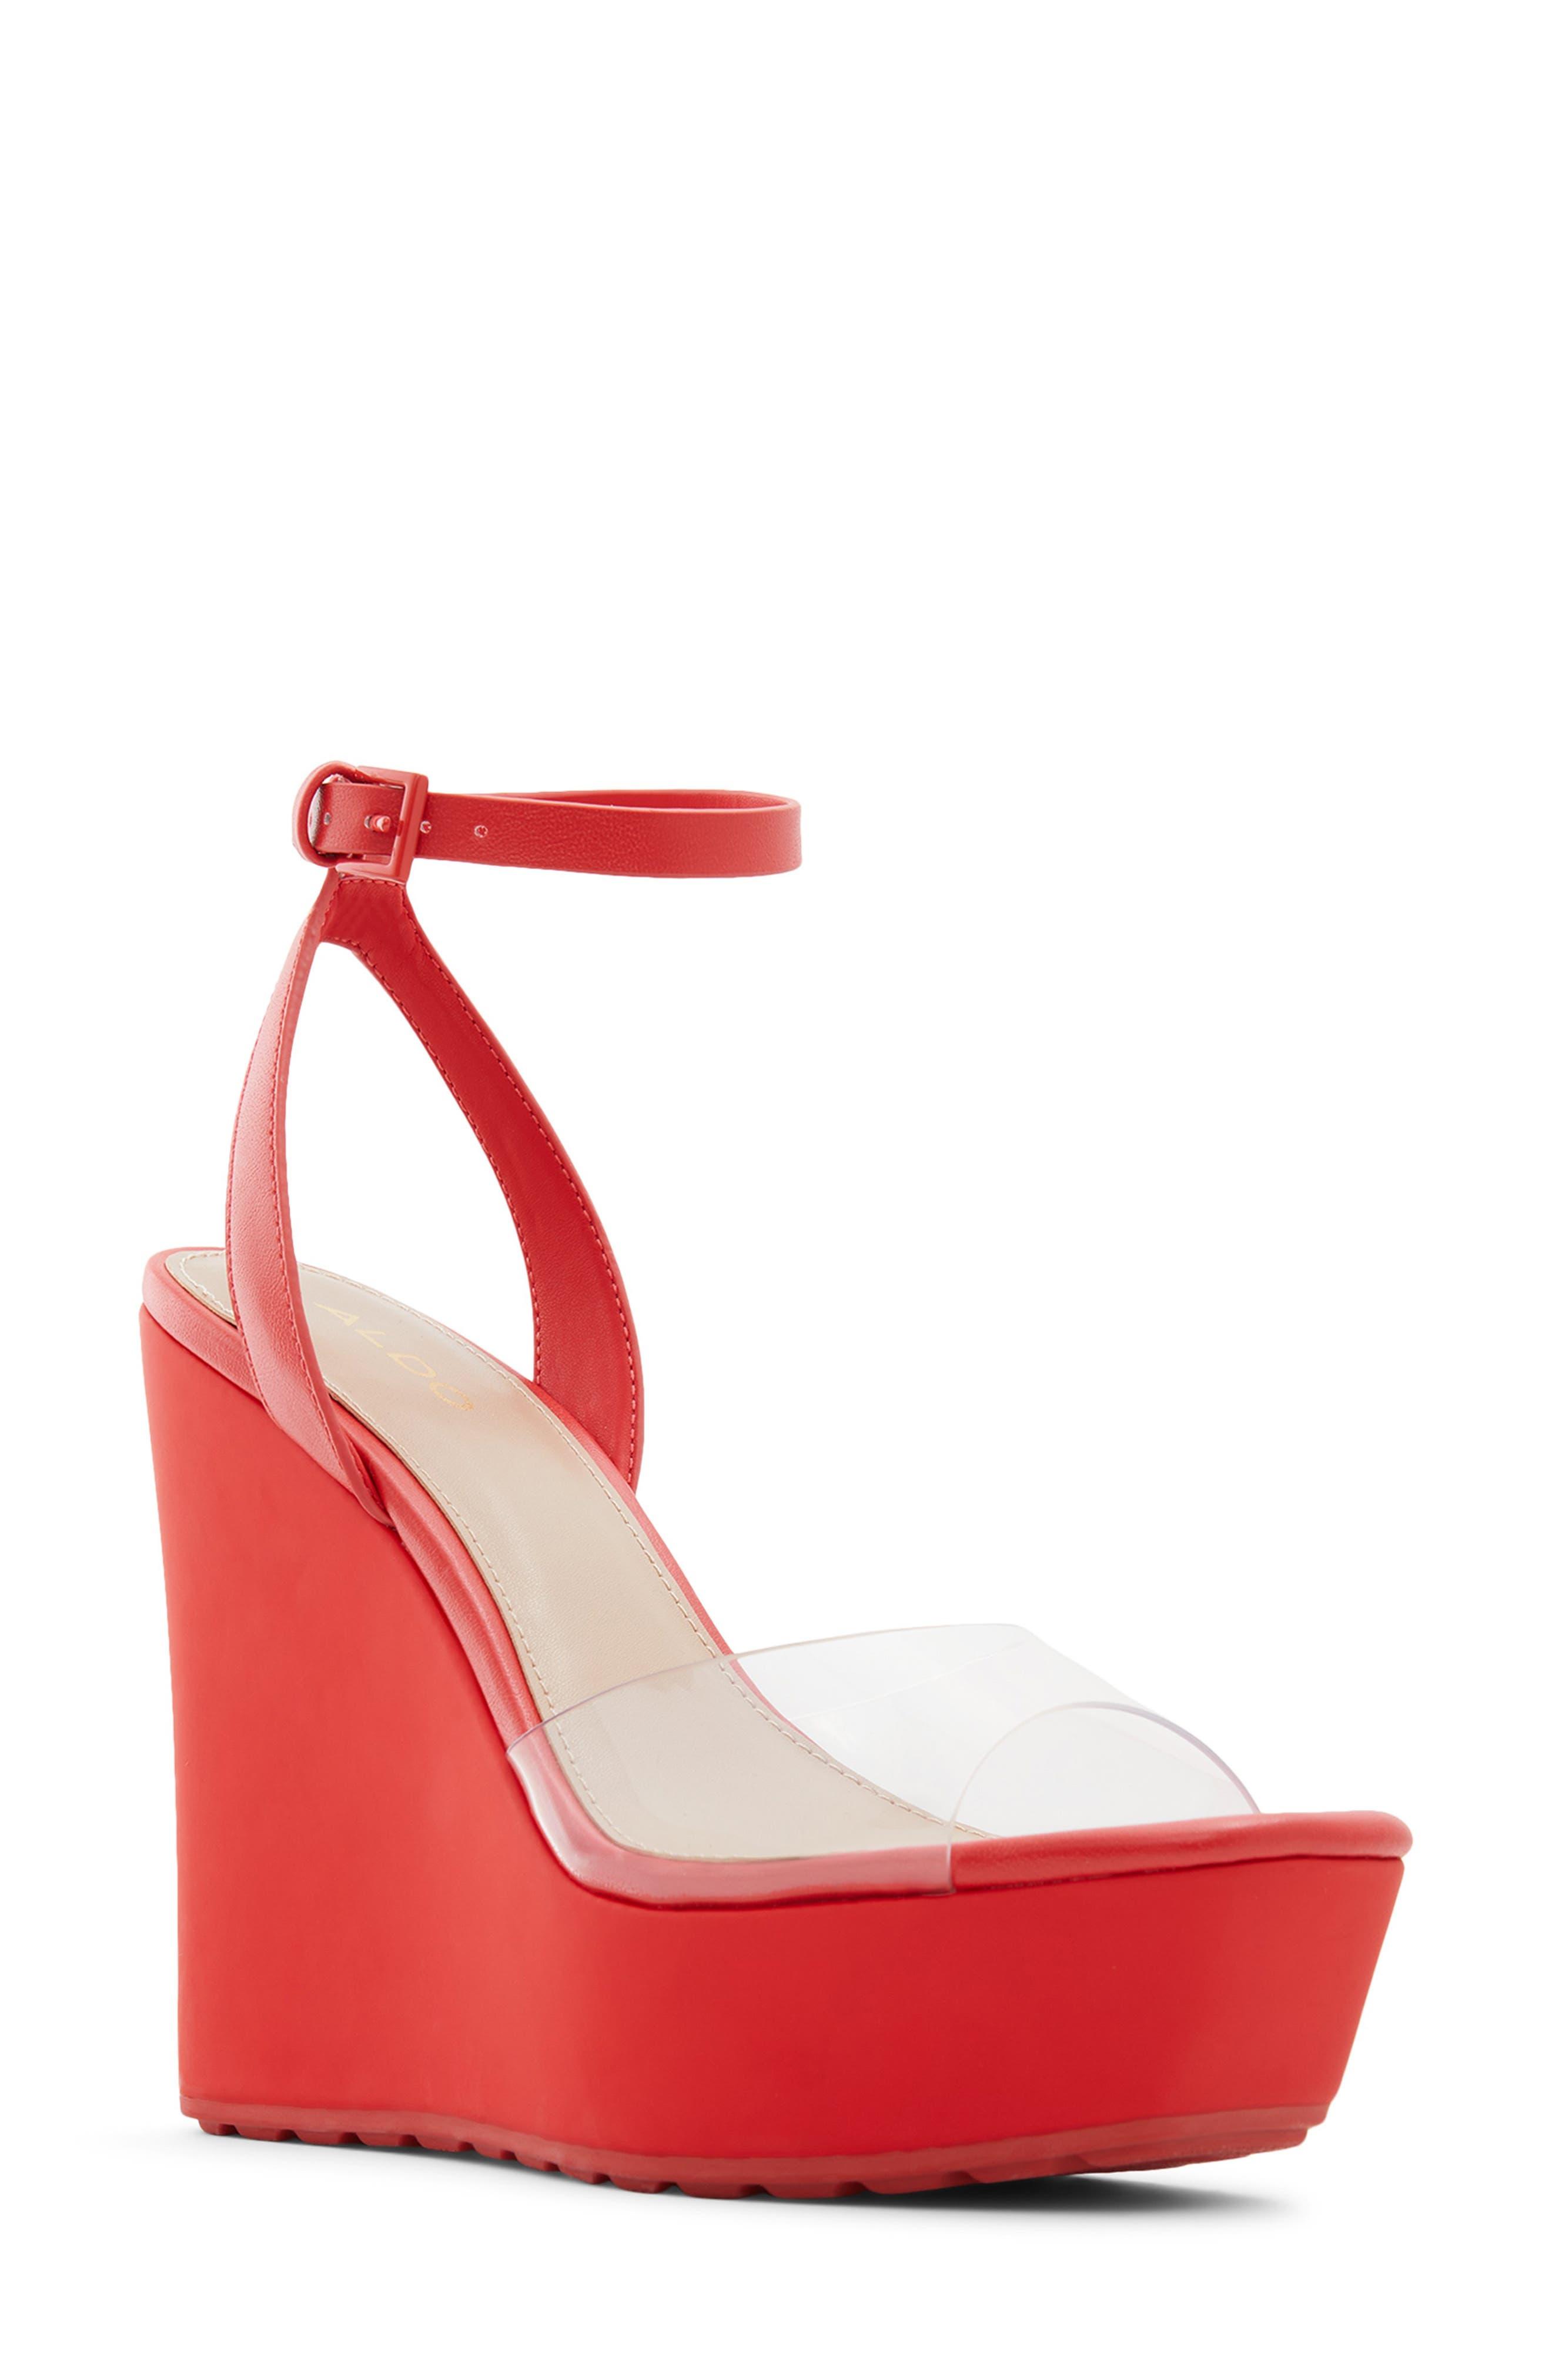 Verly Platform Wedge Sandal